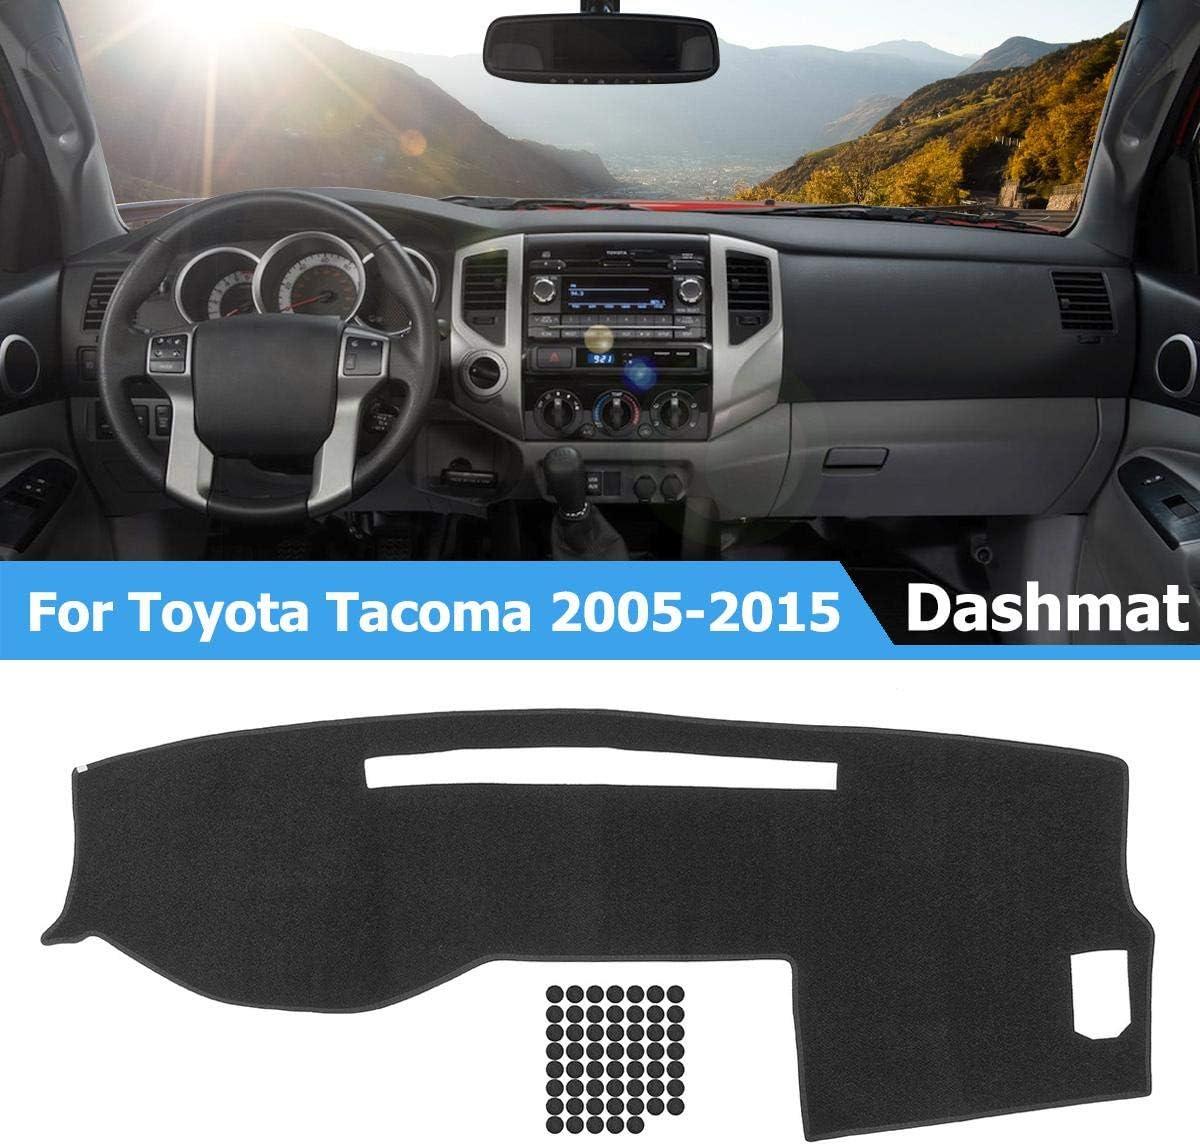 Fly5D Dashmat Dash Mat Dashboard Sun Cover Pad Fits For Toyota 4Runner 2003-2009